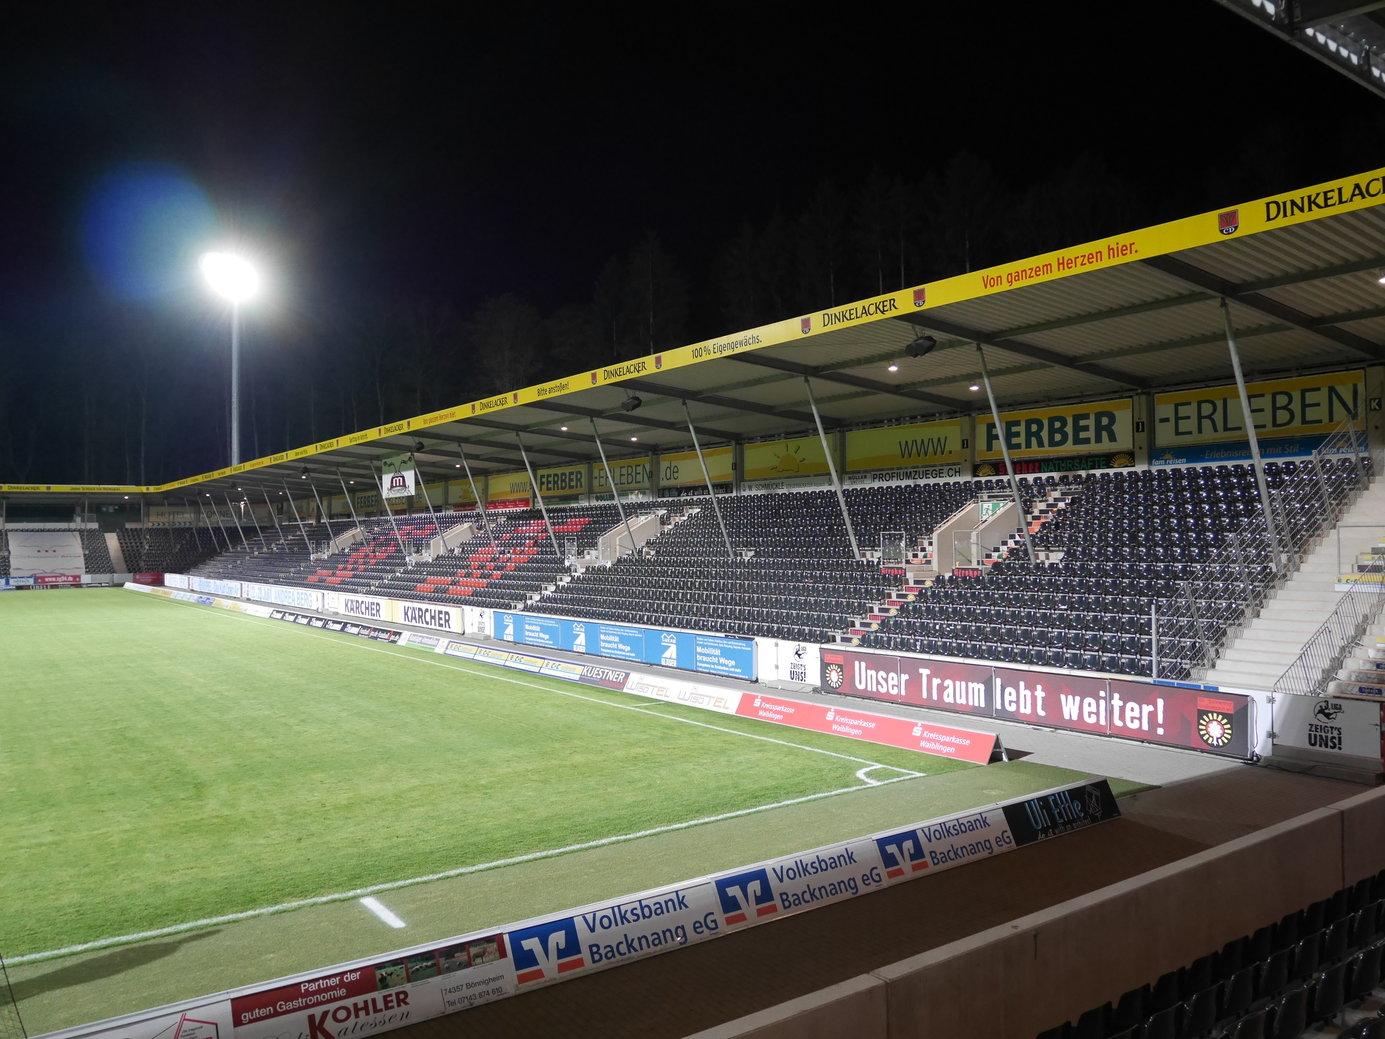 Mechatronik Arena